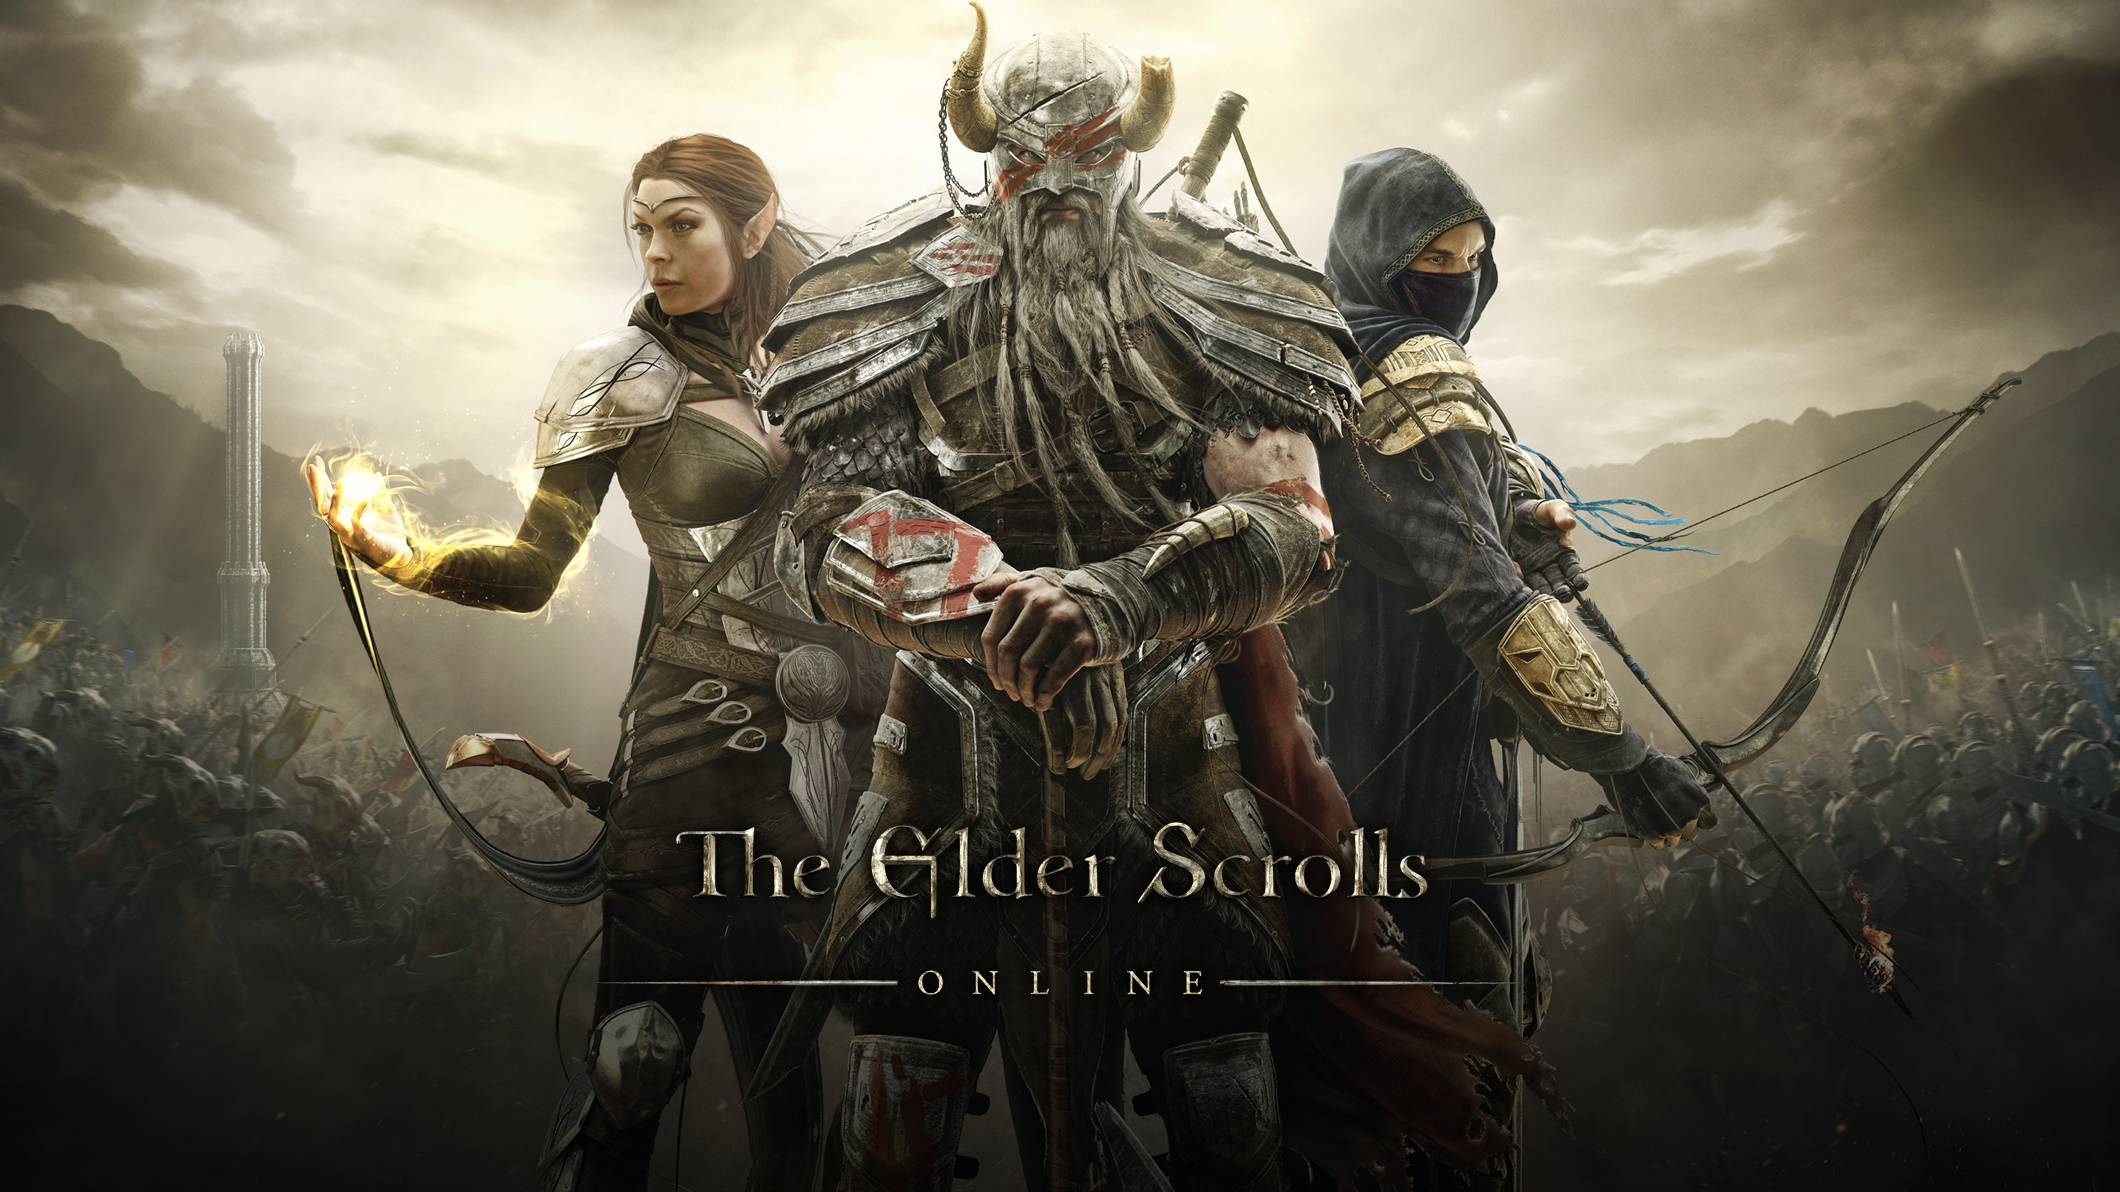 The Elder Scrolls Online Wallpaper 6